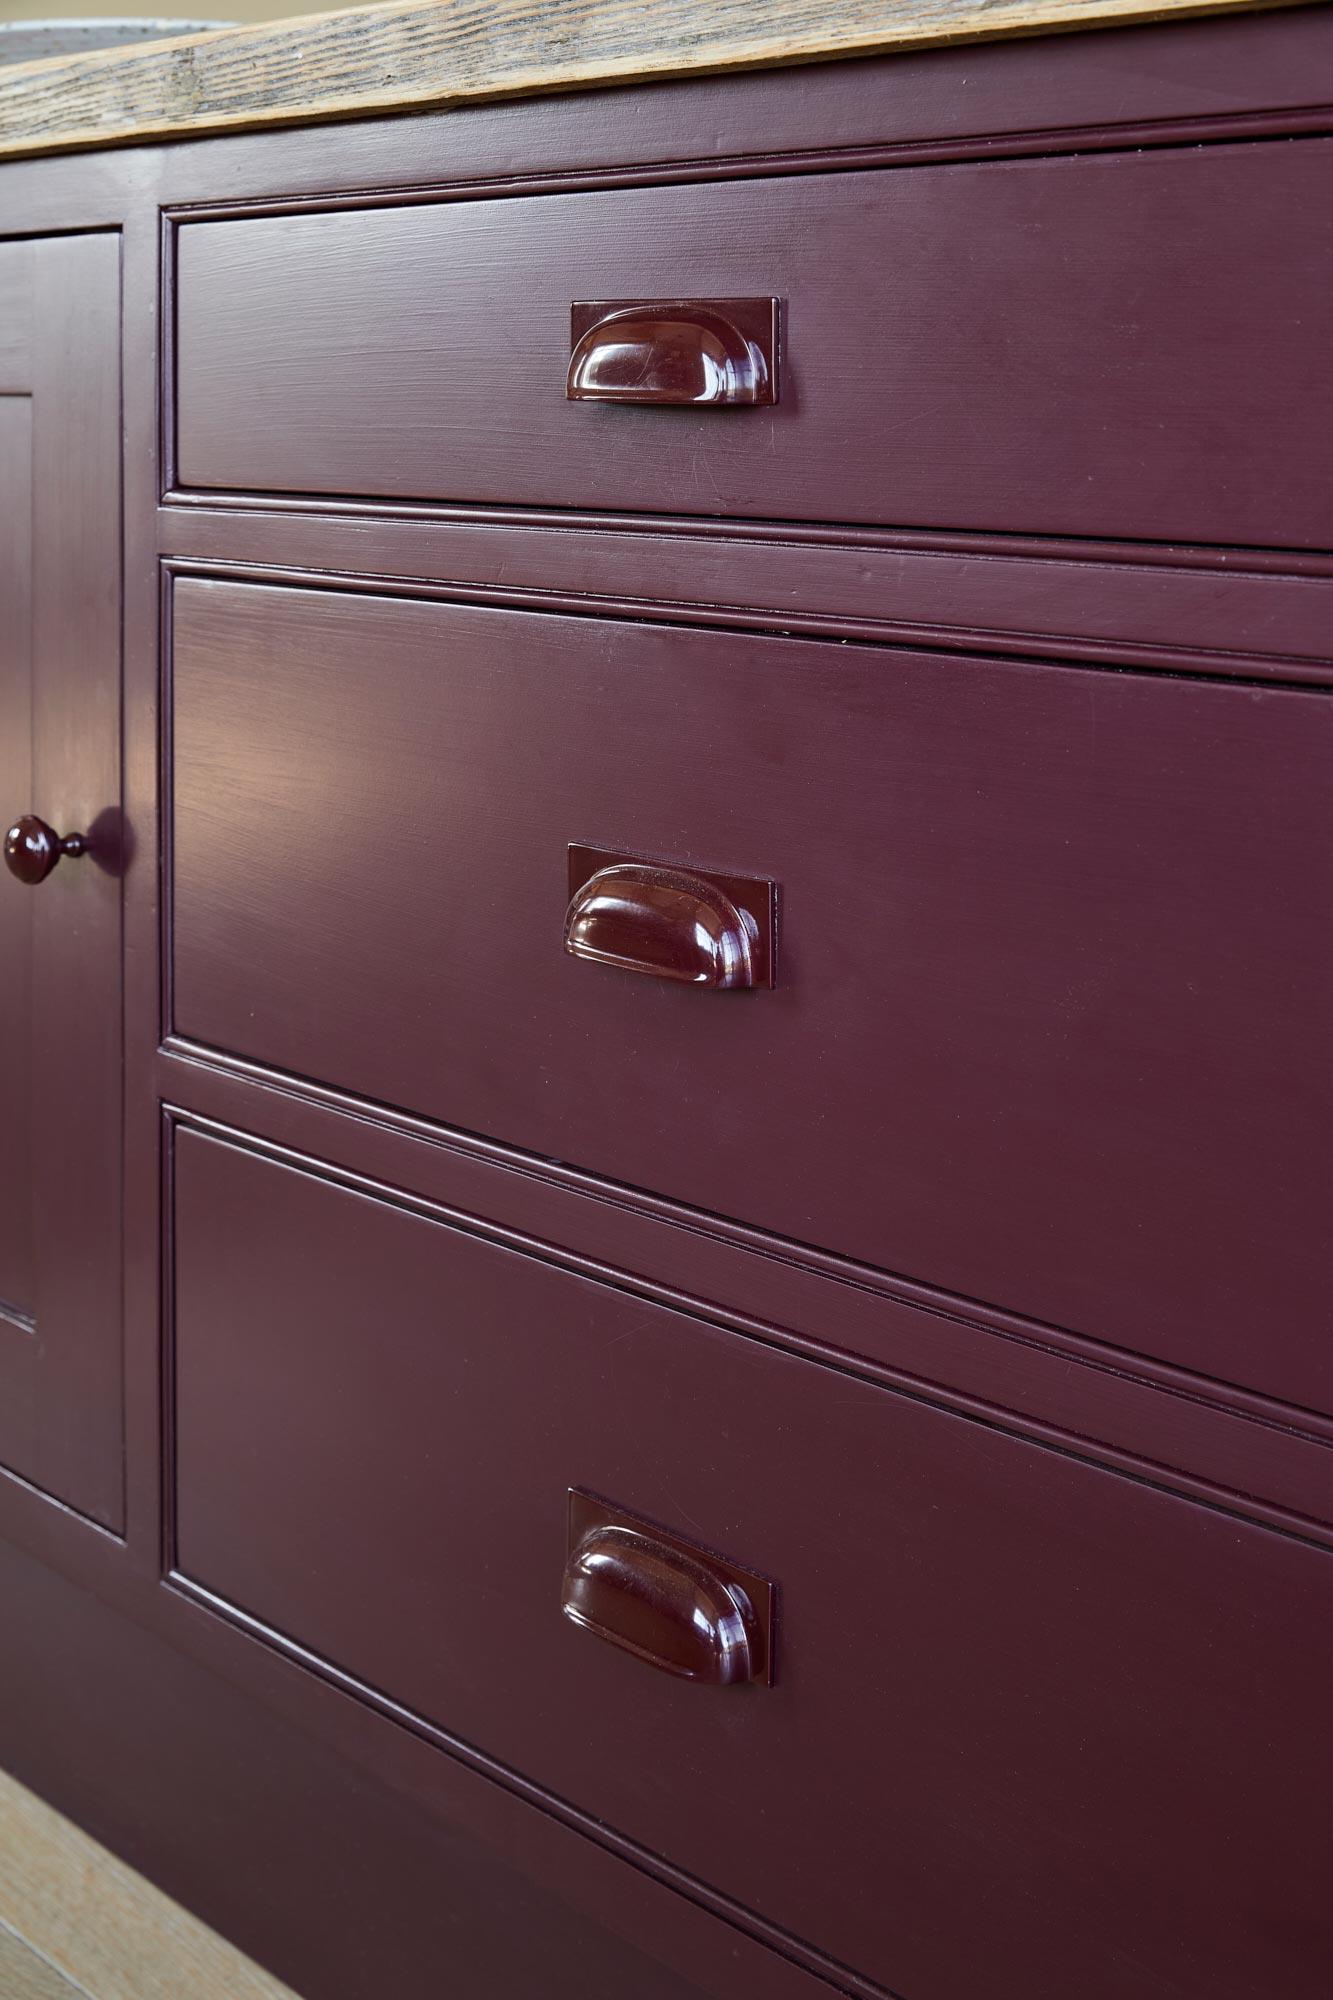 Powder coated handles on kitchen units